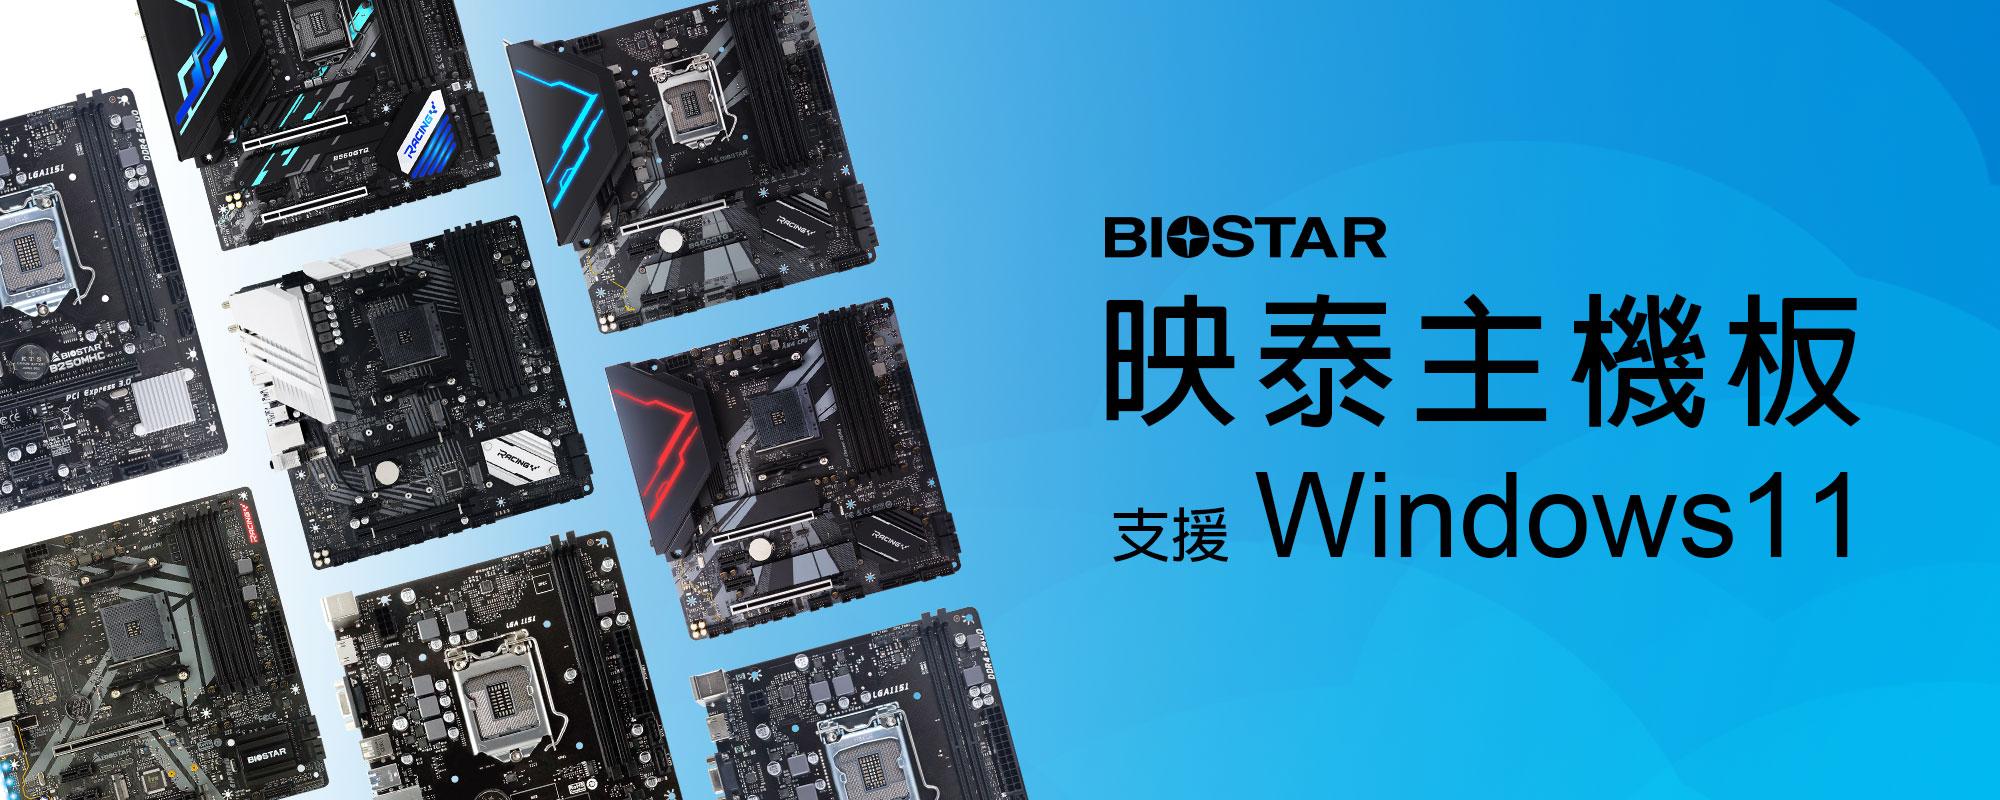 BIOSTAR映泰主機板支援升級Windows 11作業系統